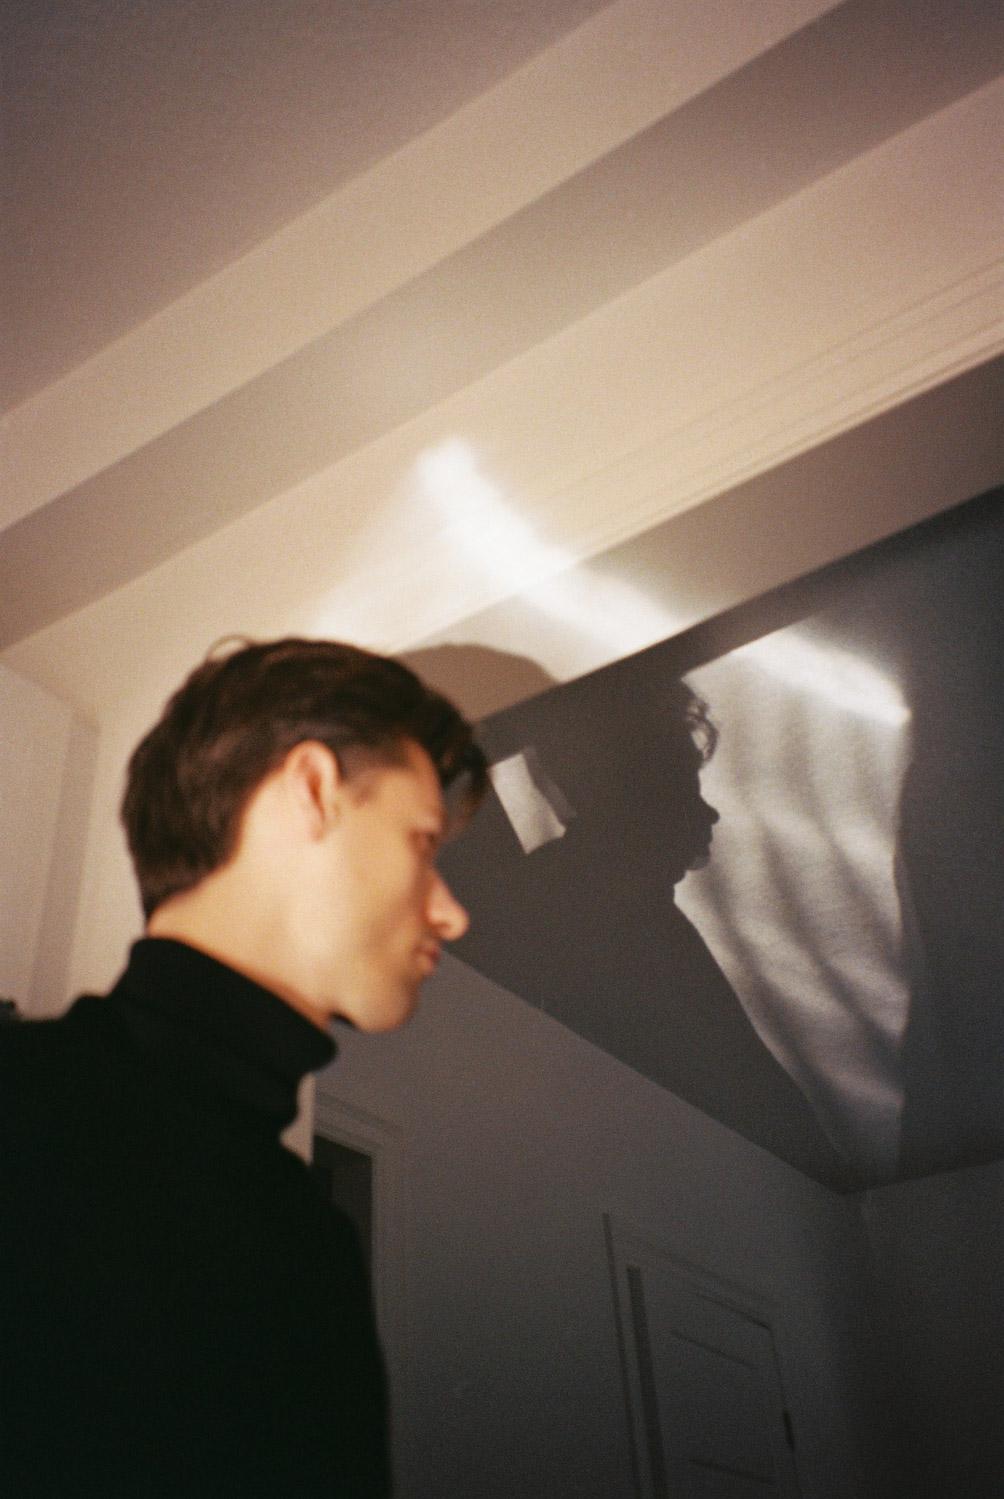 boy standing in reflected light.jpg